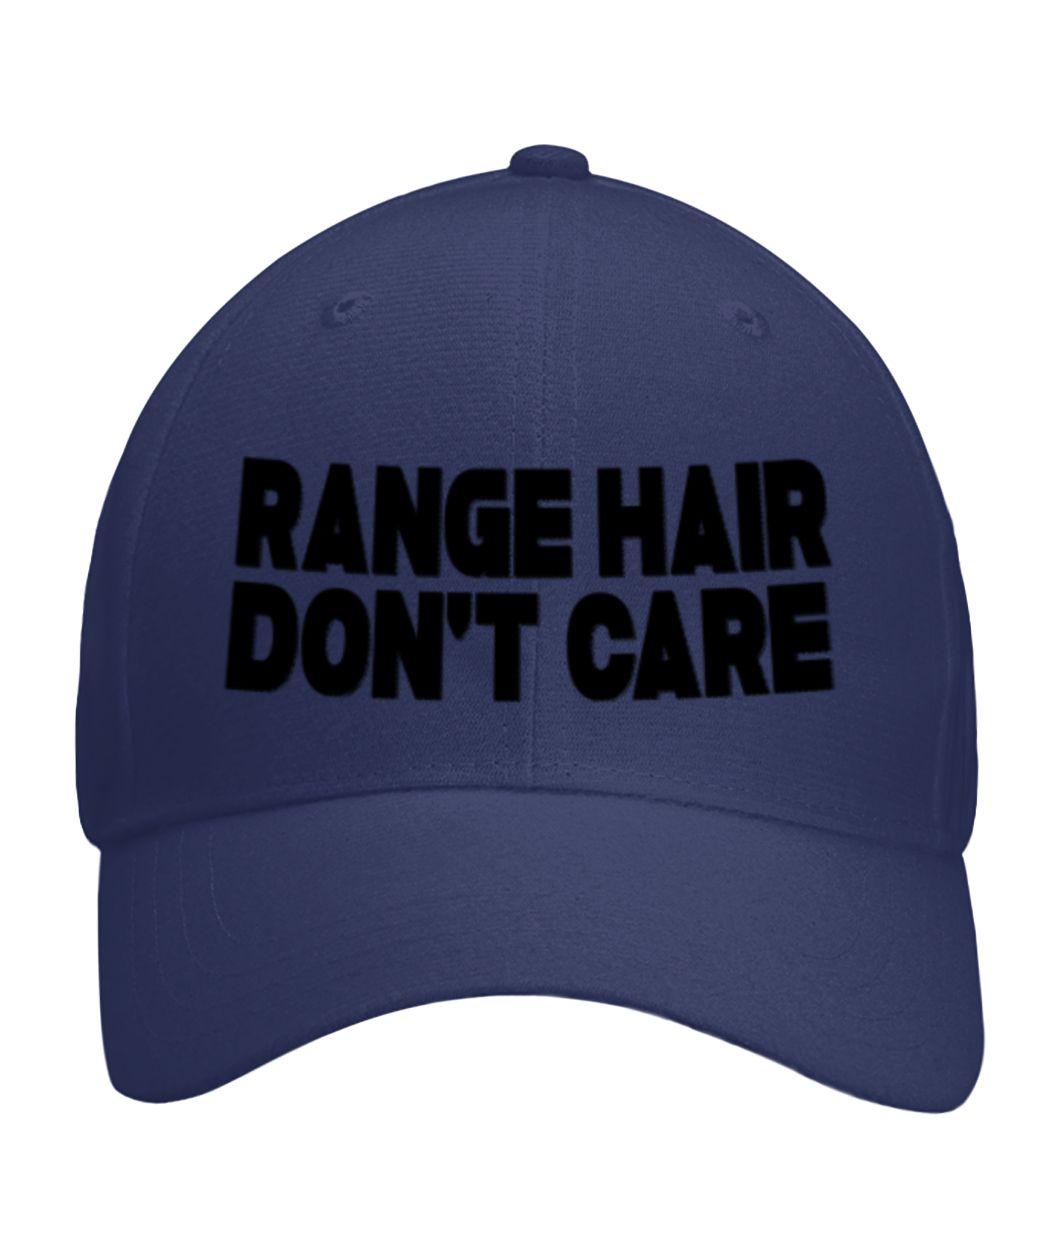 3d85e213d085 Top 10 Punto Medio Noticias | Molon Labe Tactical Hat